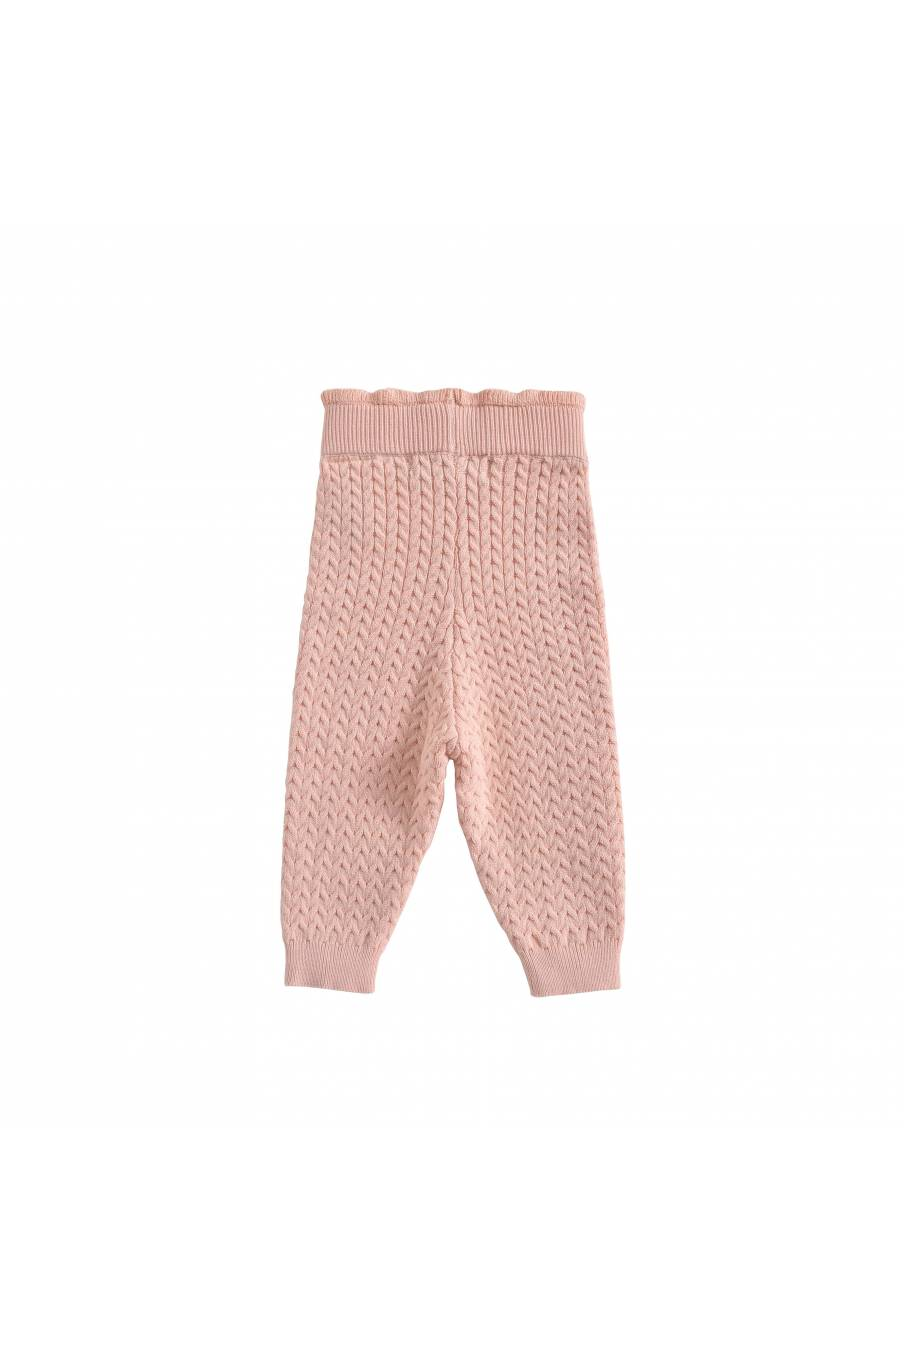 boheme chic vintage leggings bébé fille moldavia blush